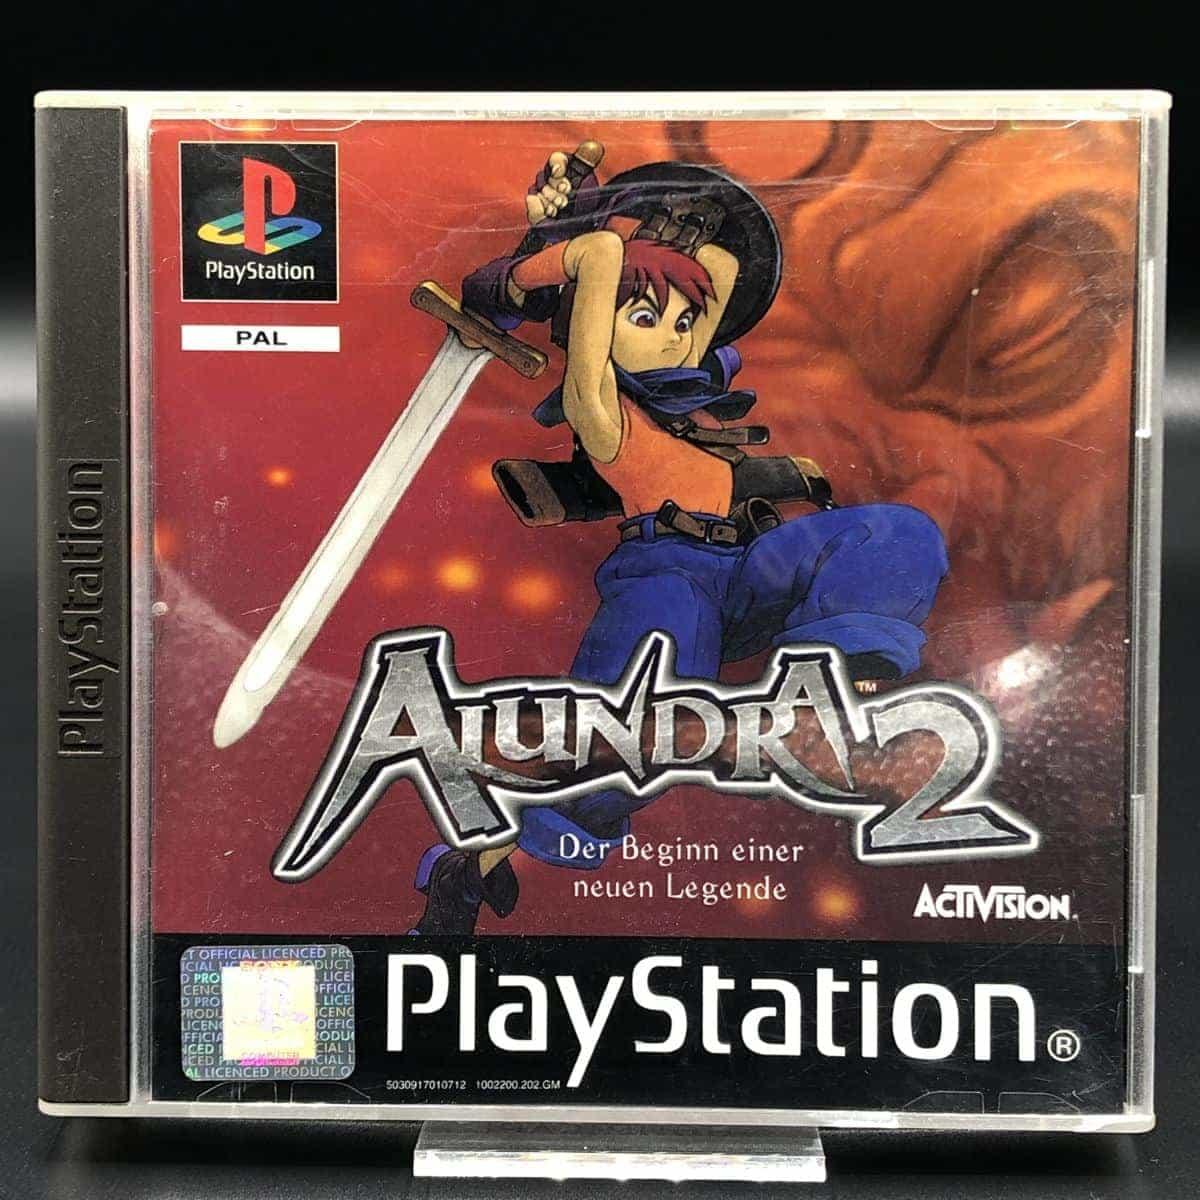 PS1 Alundra 2: A New Legend Begins (Komplett) (Gut) Sony PlayStation 1